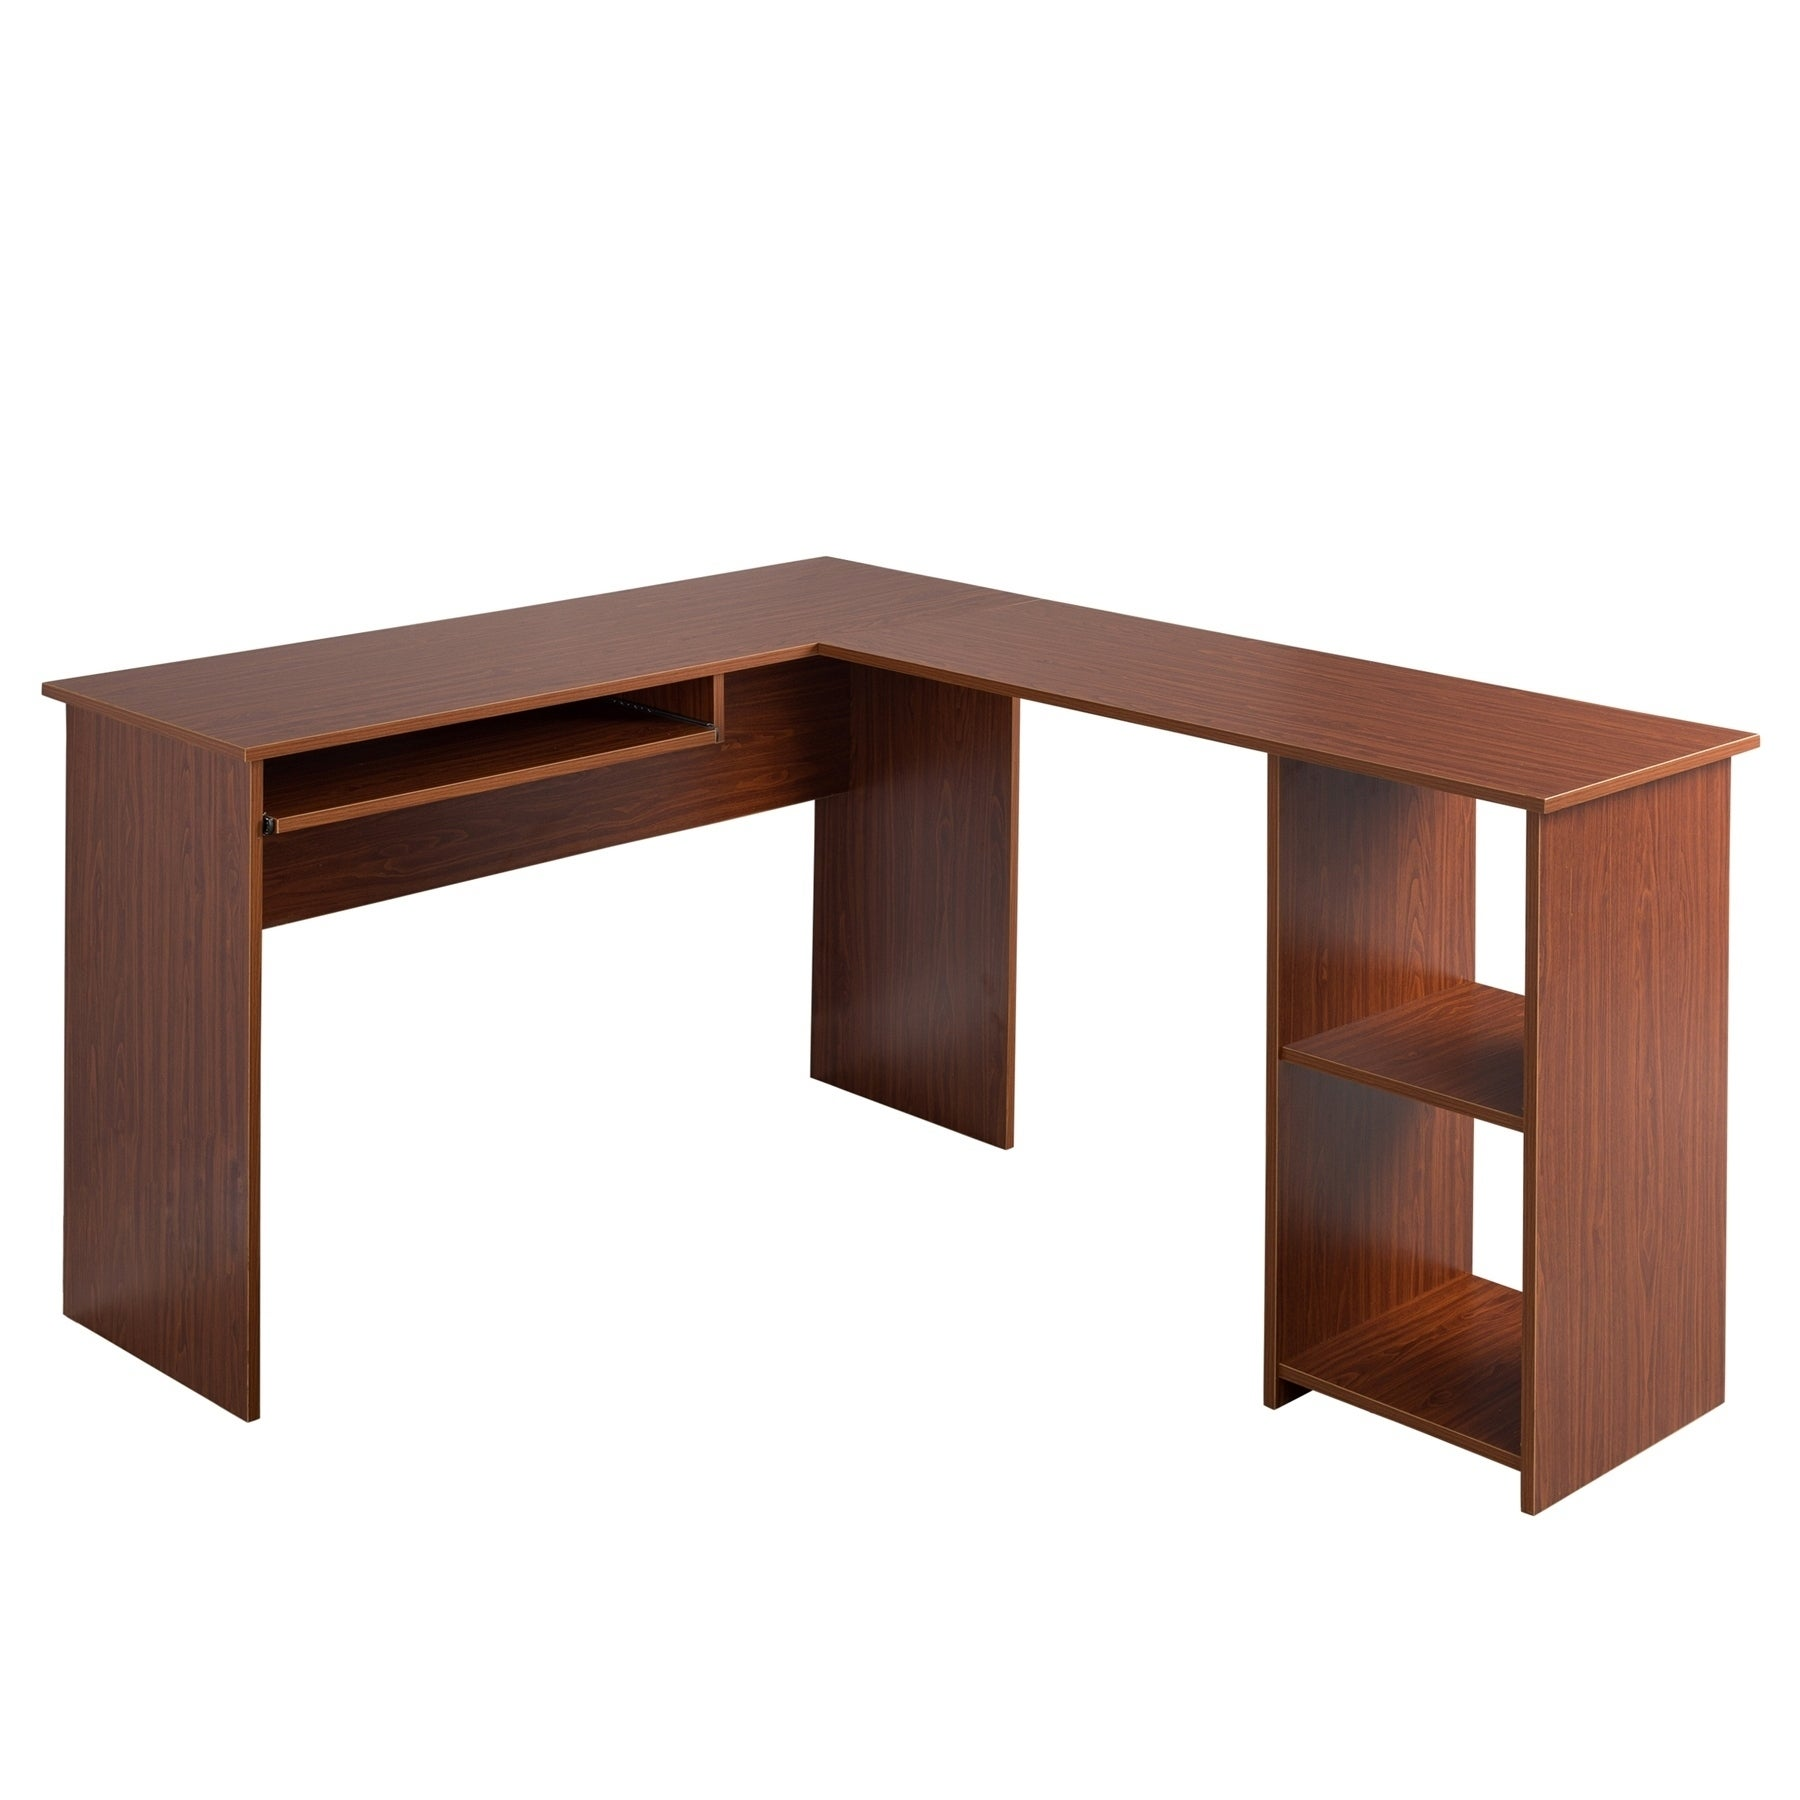 Beau Shop Fineboard L Shaped Office Corner Desk 2 Side Shelves   Free Shipping  Today   Overstock.com   18778846